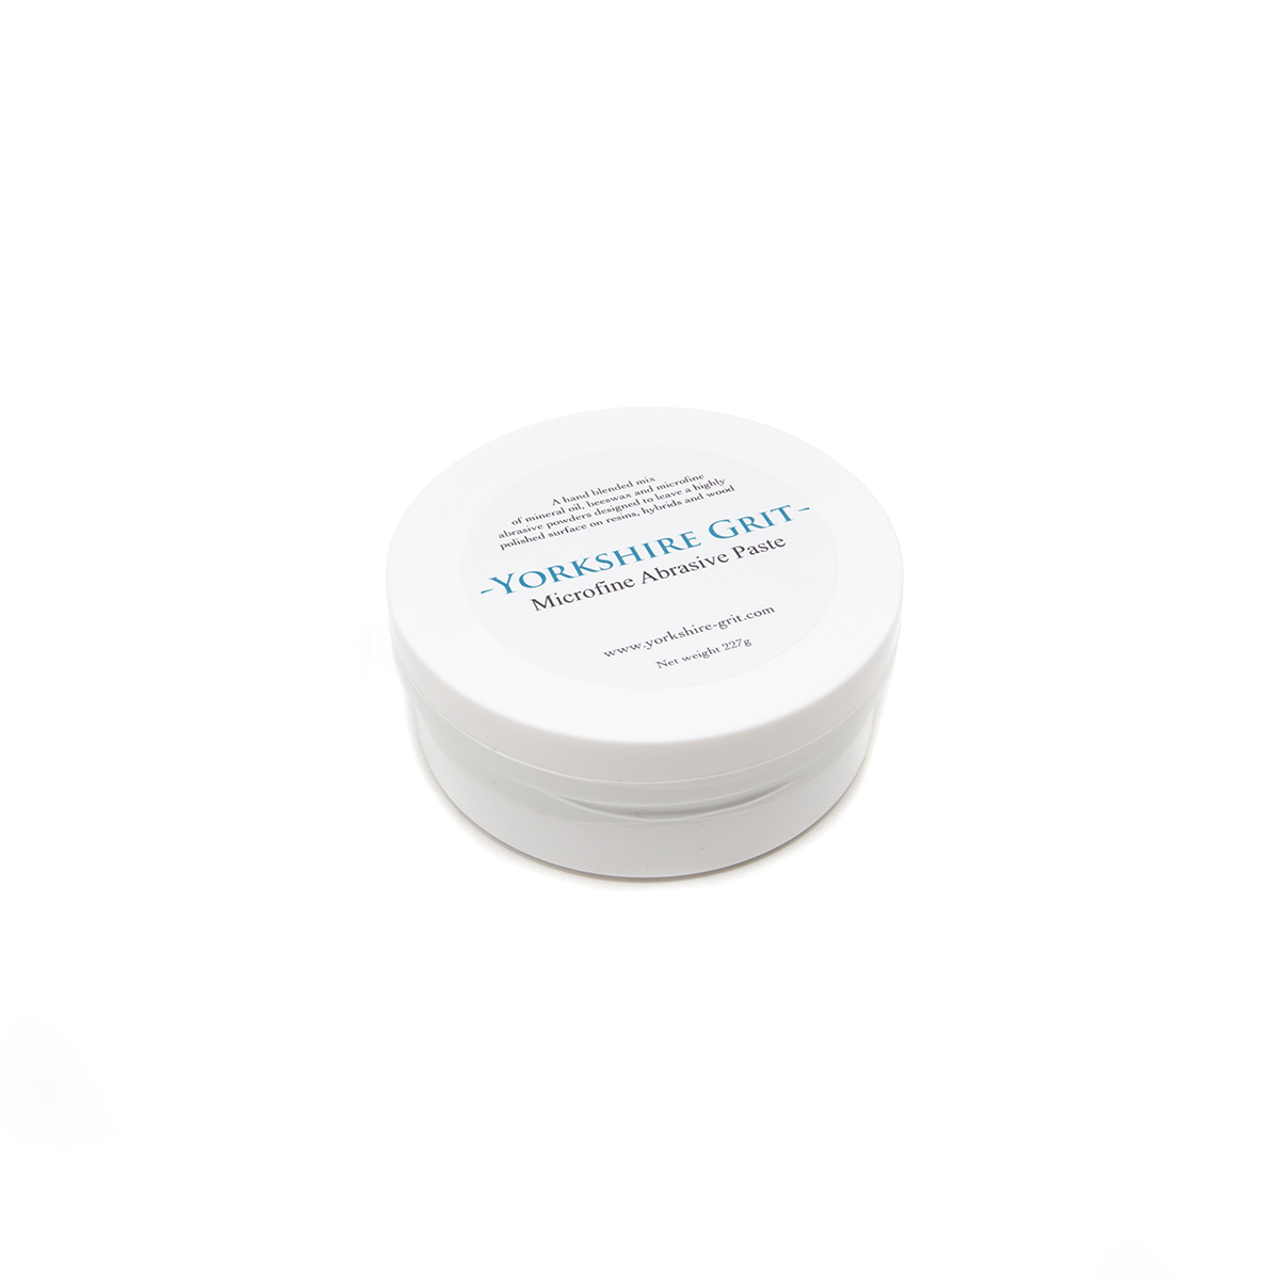 Yorkshire Grit Microfine Abrasive Paste - 227g